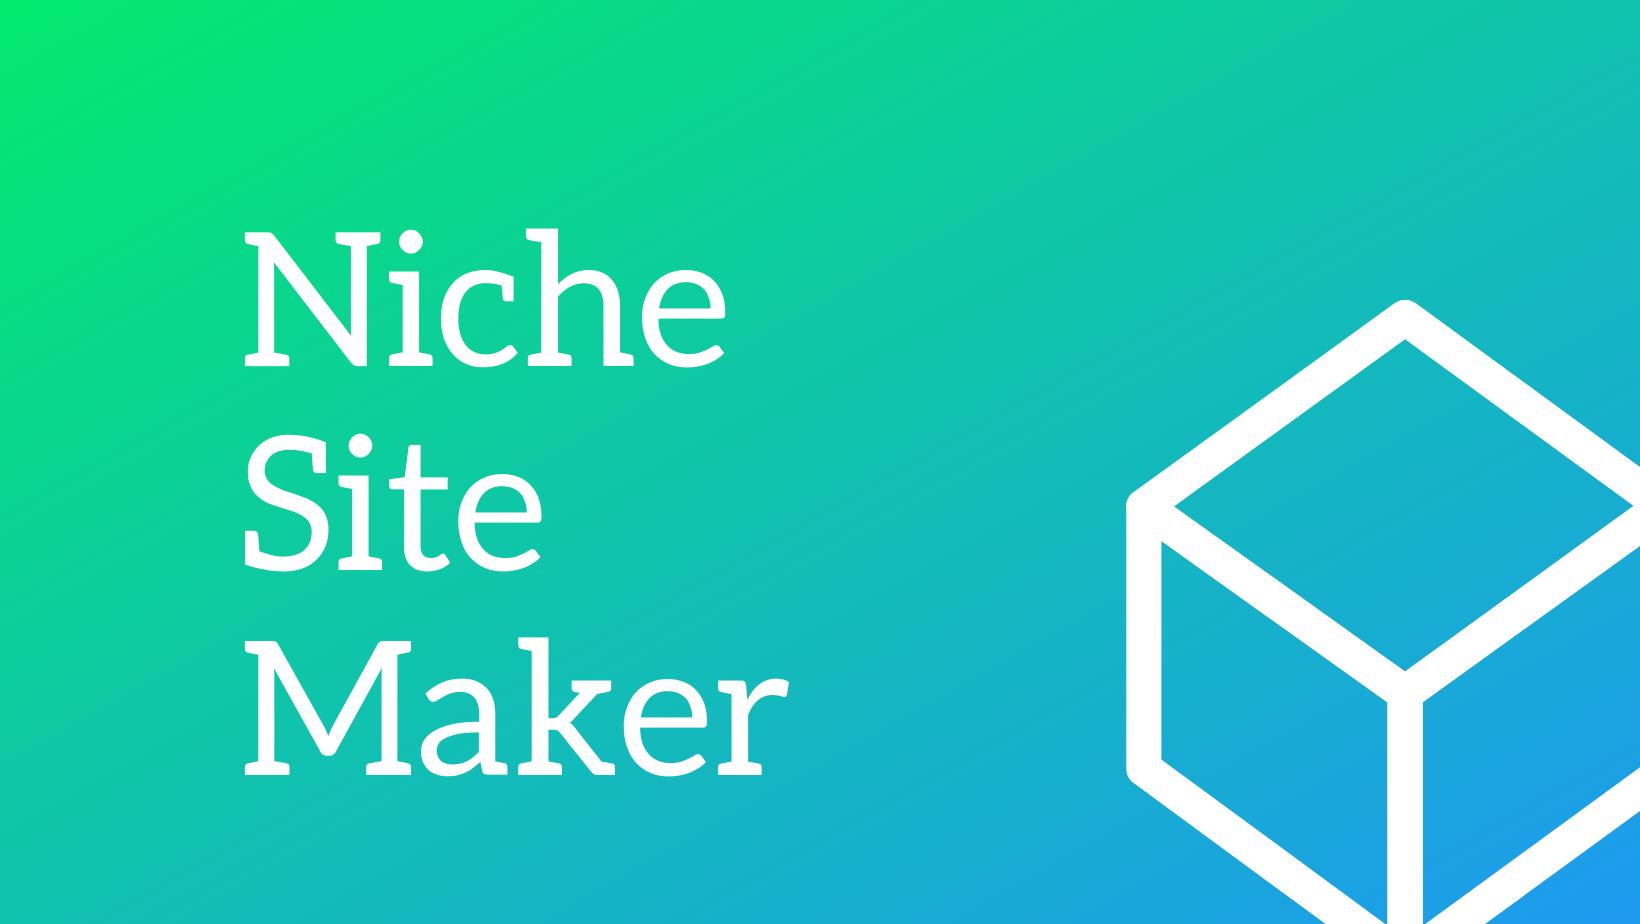 Niche Site Maker - Simply build niche affiliate websites